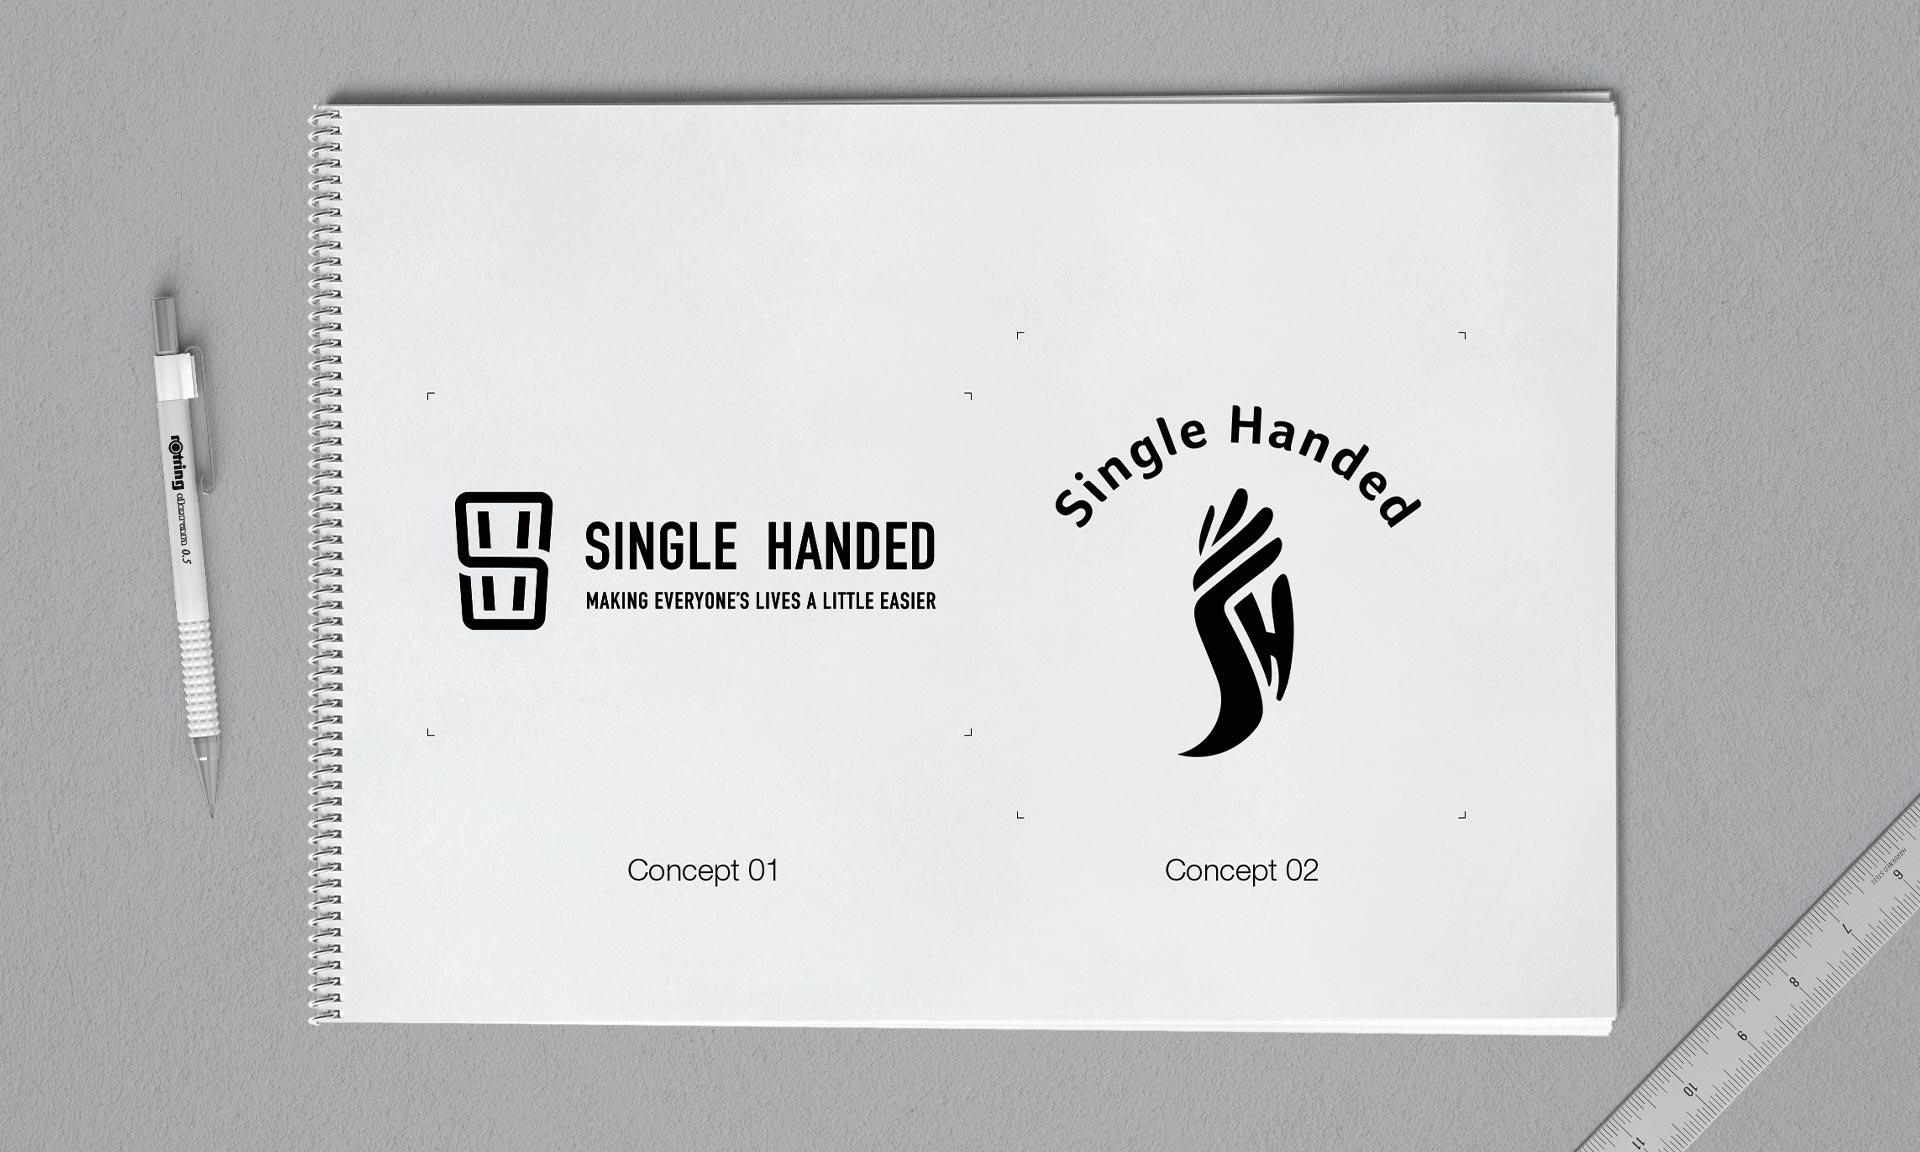 kickstarter-projects-logo-options